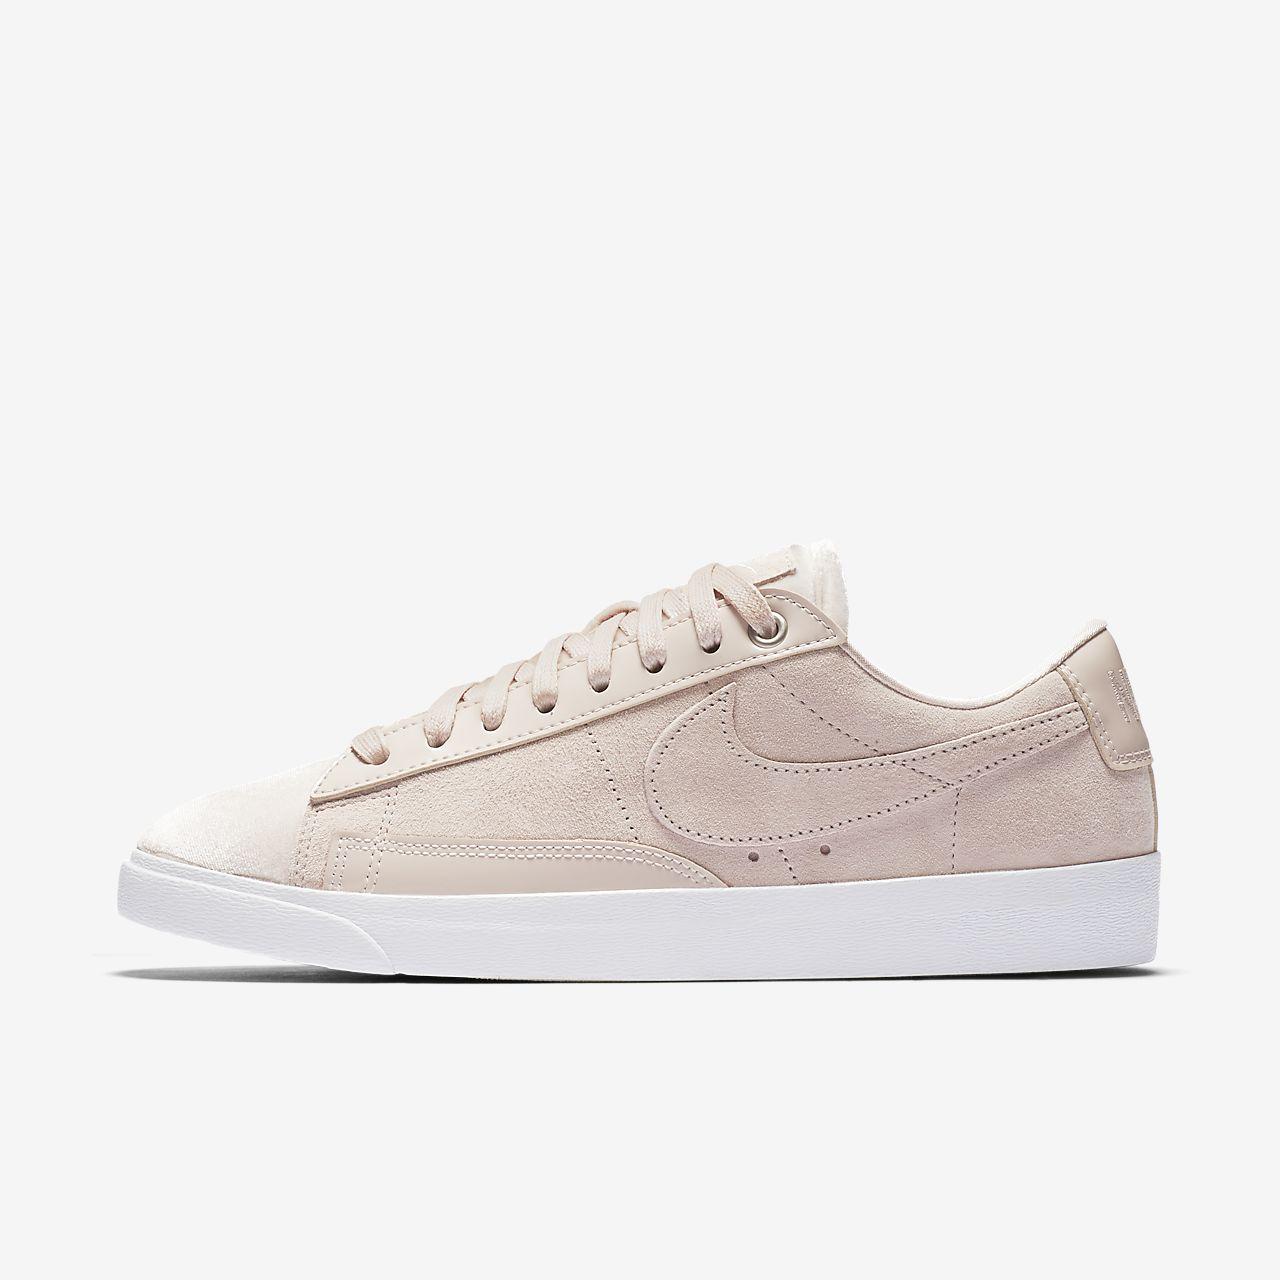 568724a7c2d0 Nike Blazer Low LX Womens Shoe ...